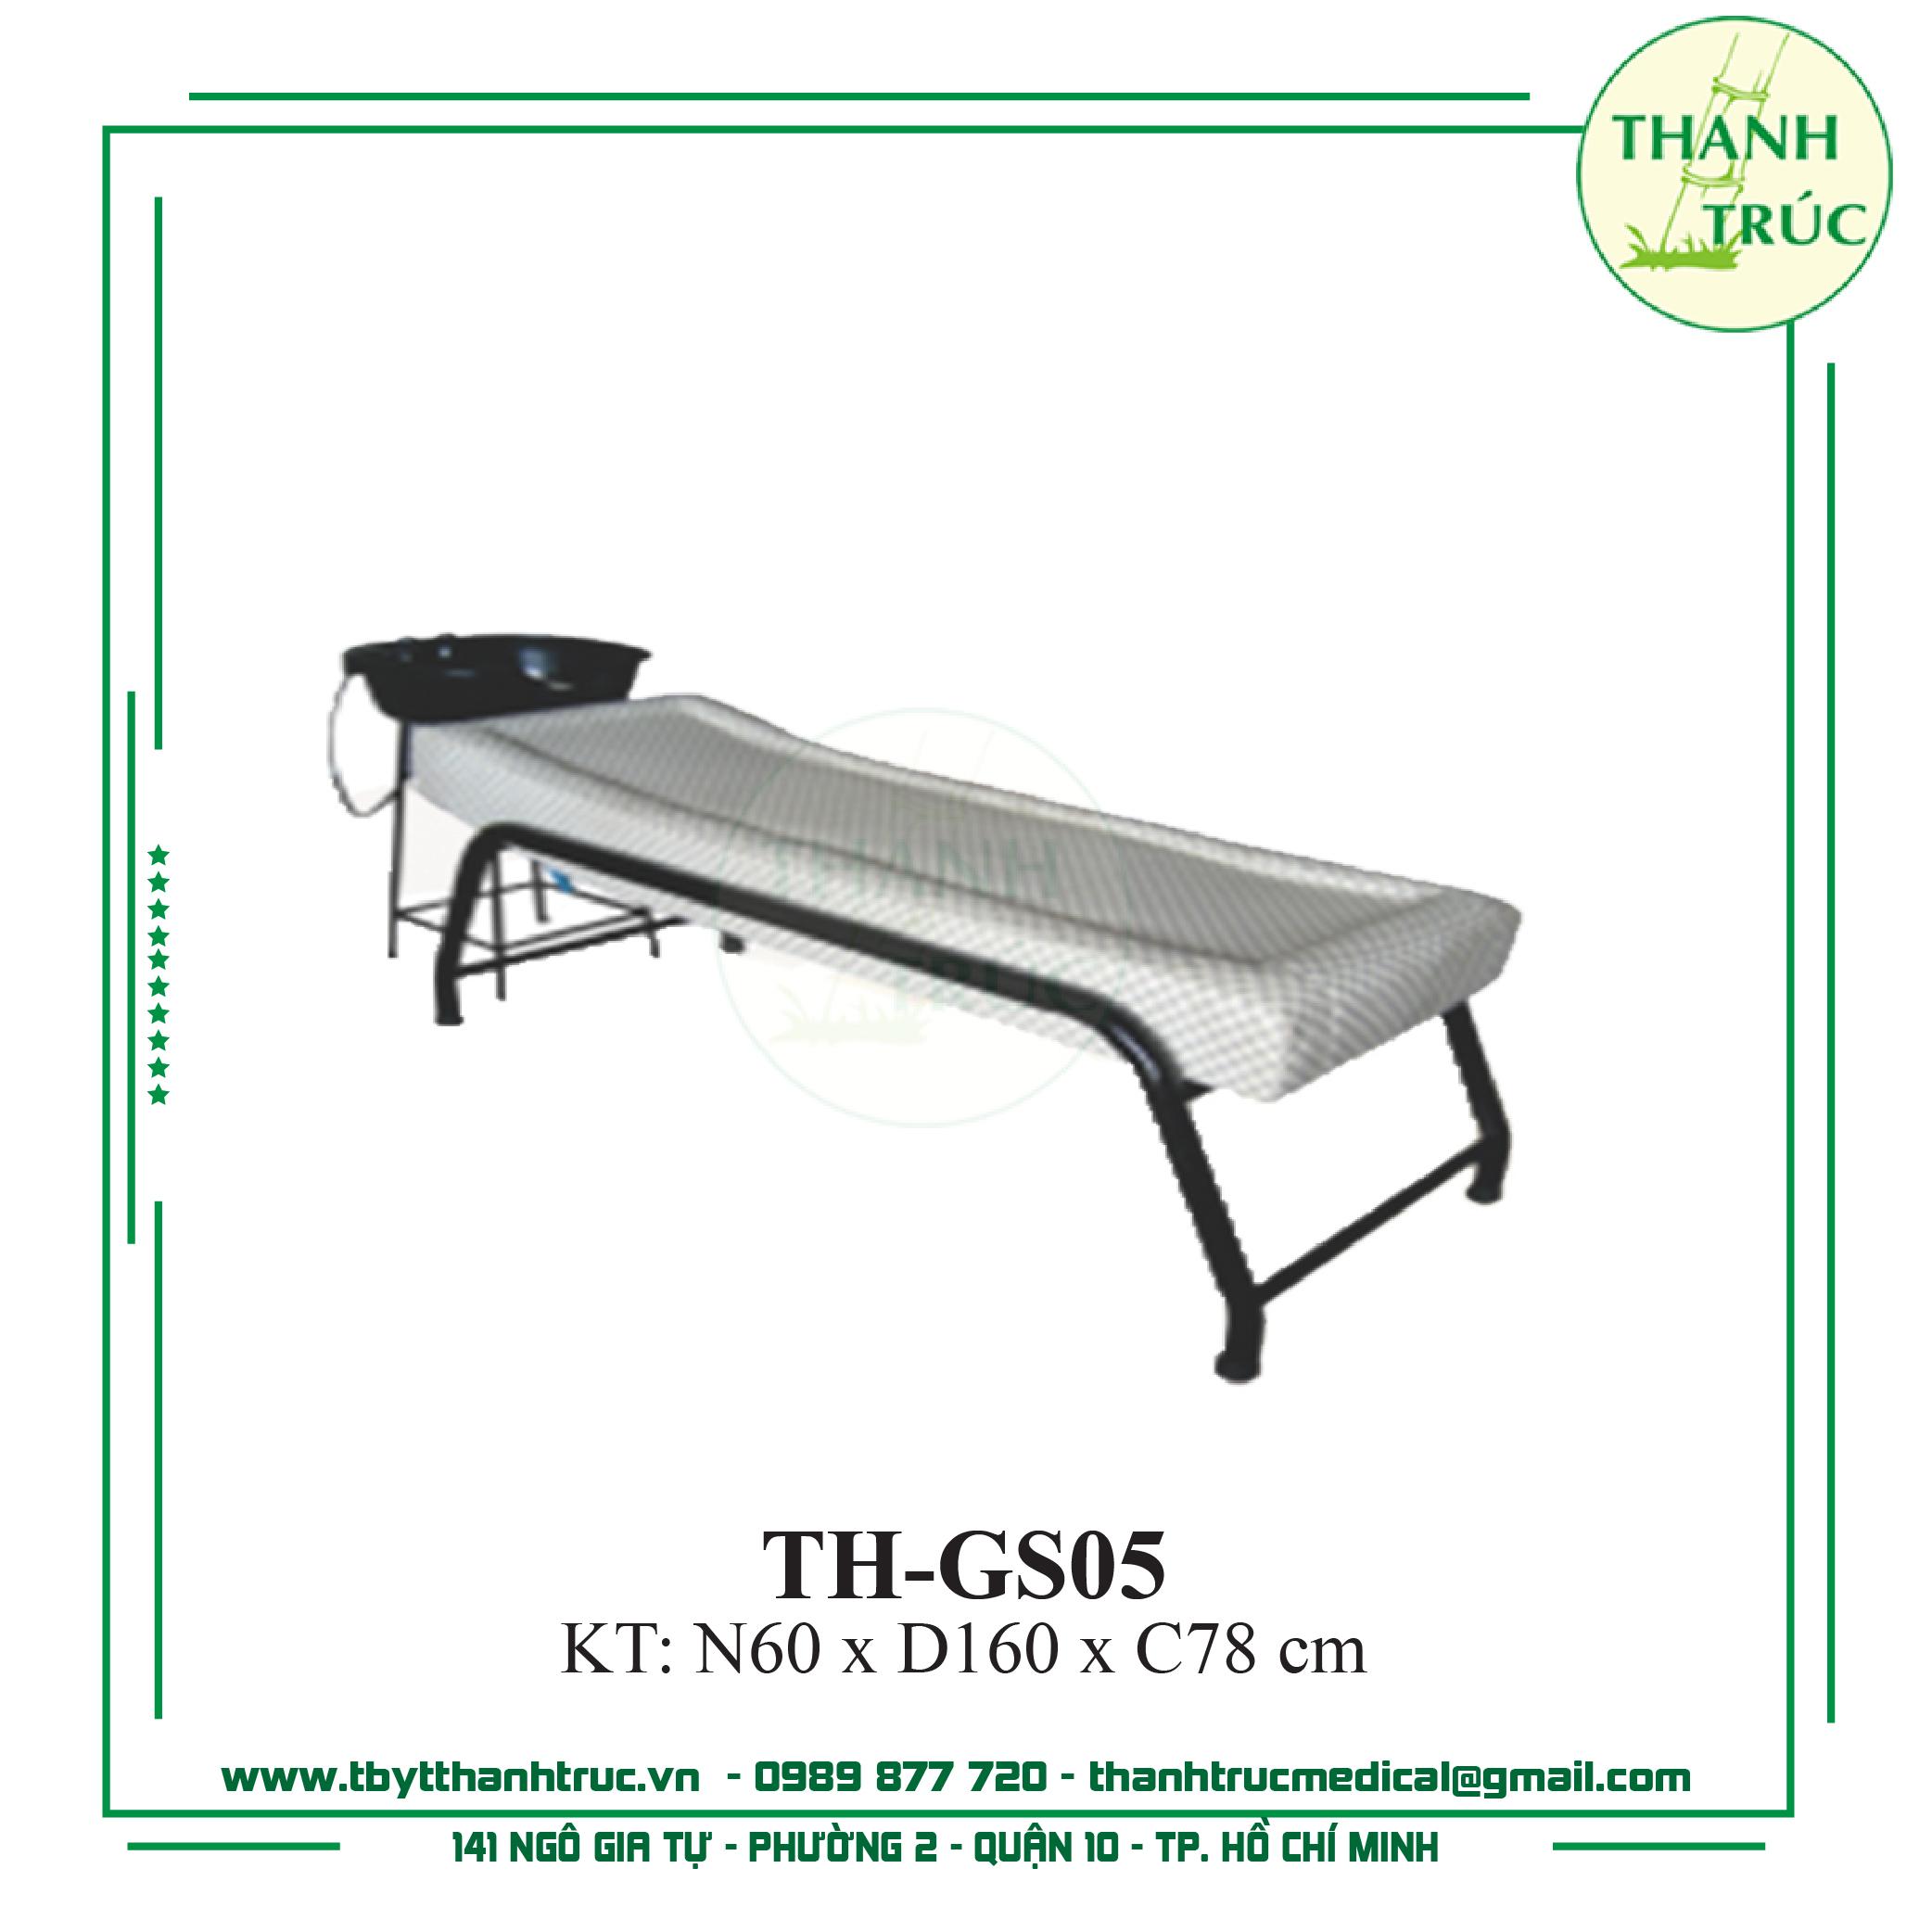 GIƯỜNG MASSAGE SẮT TH-GS05